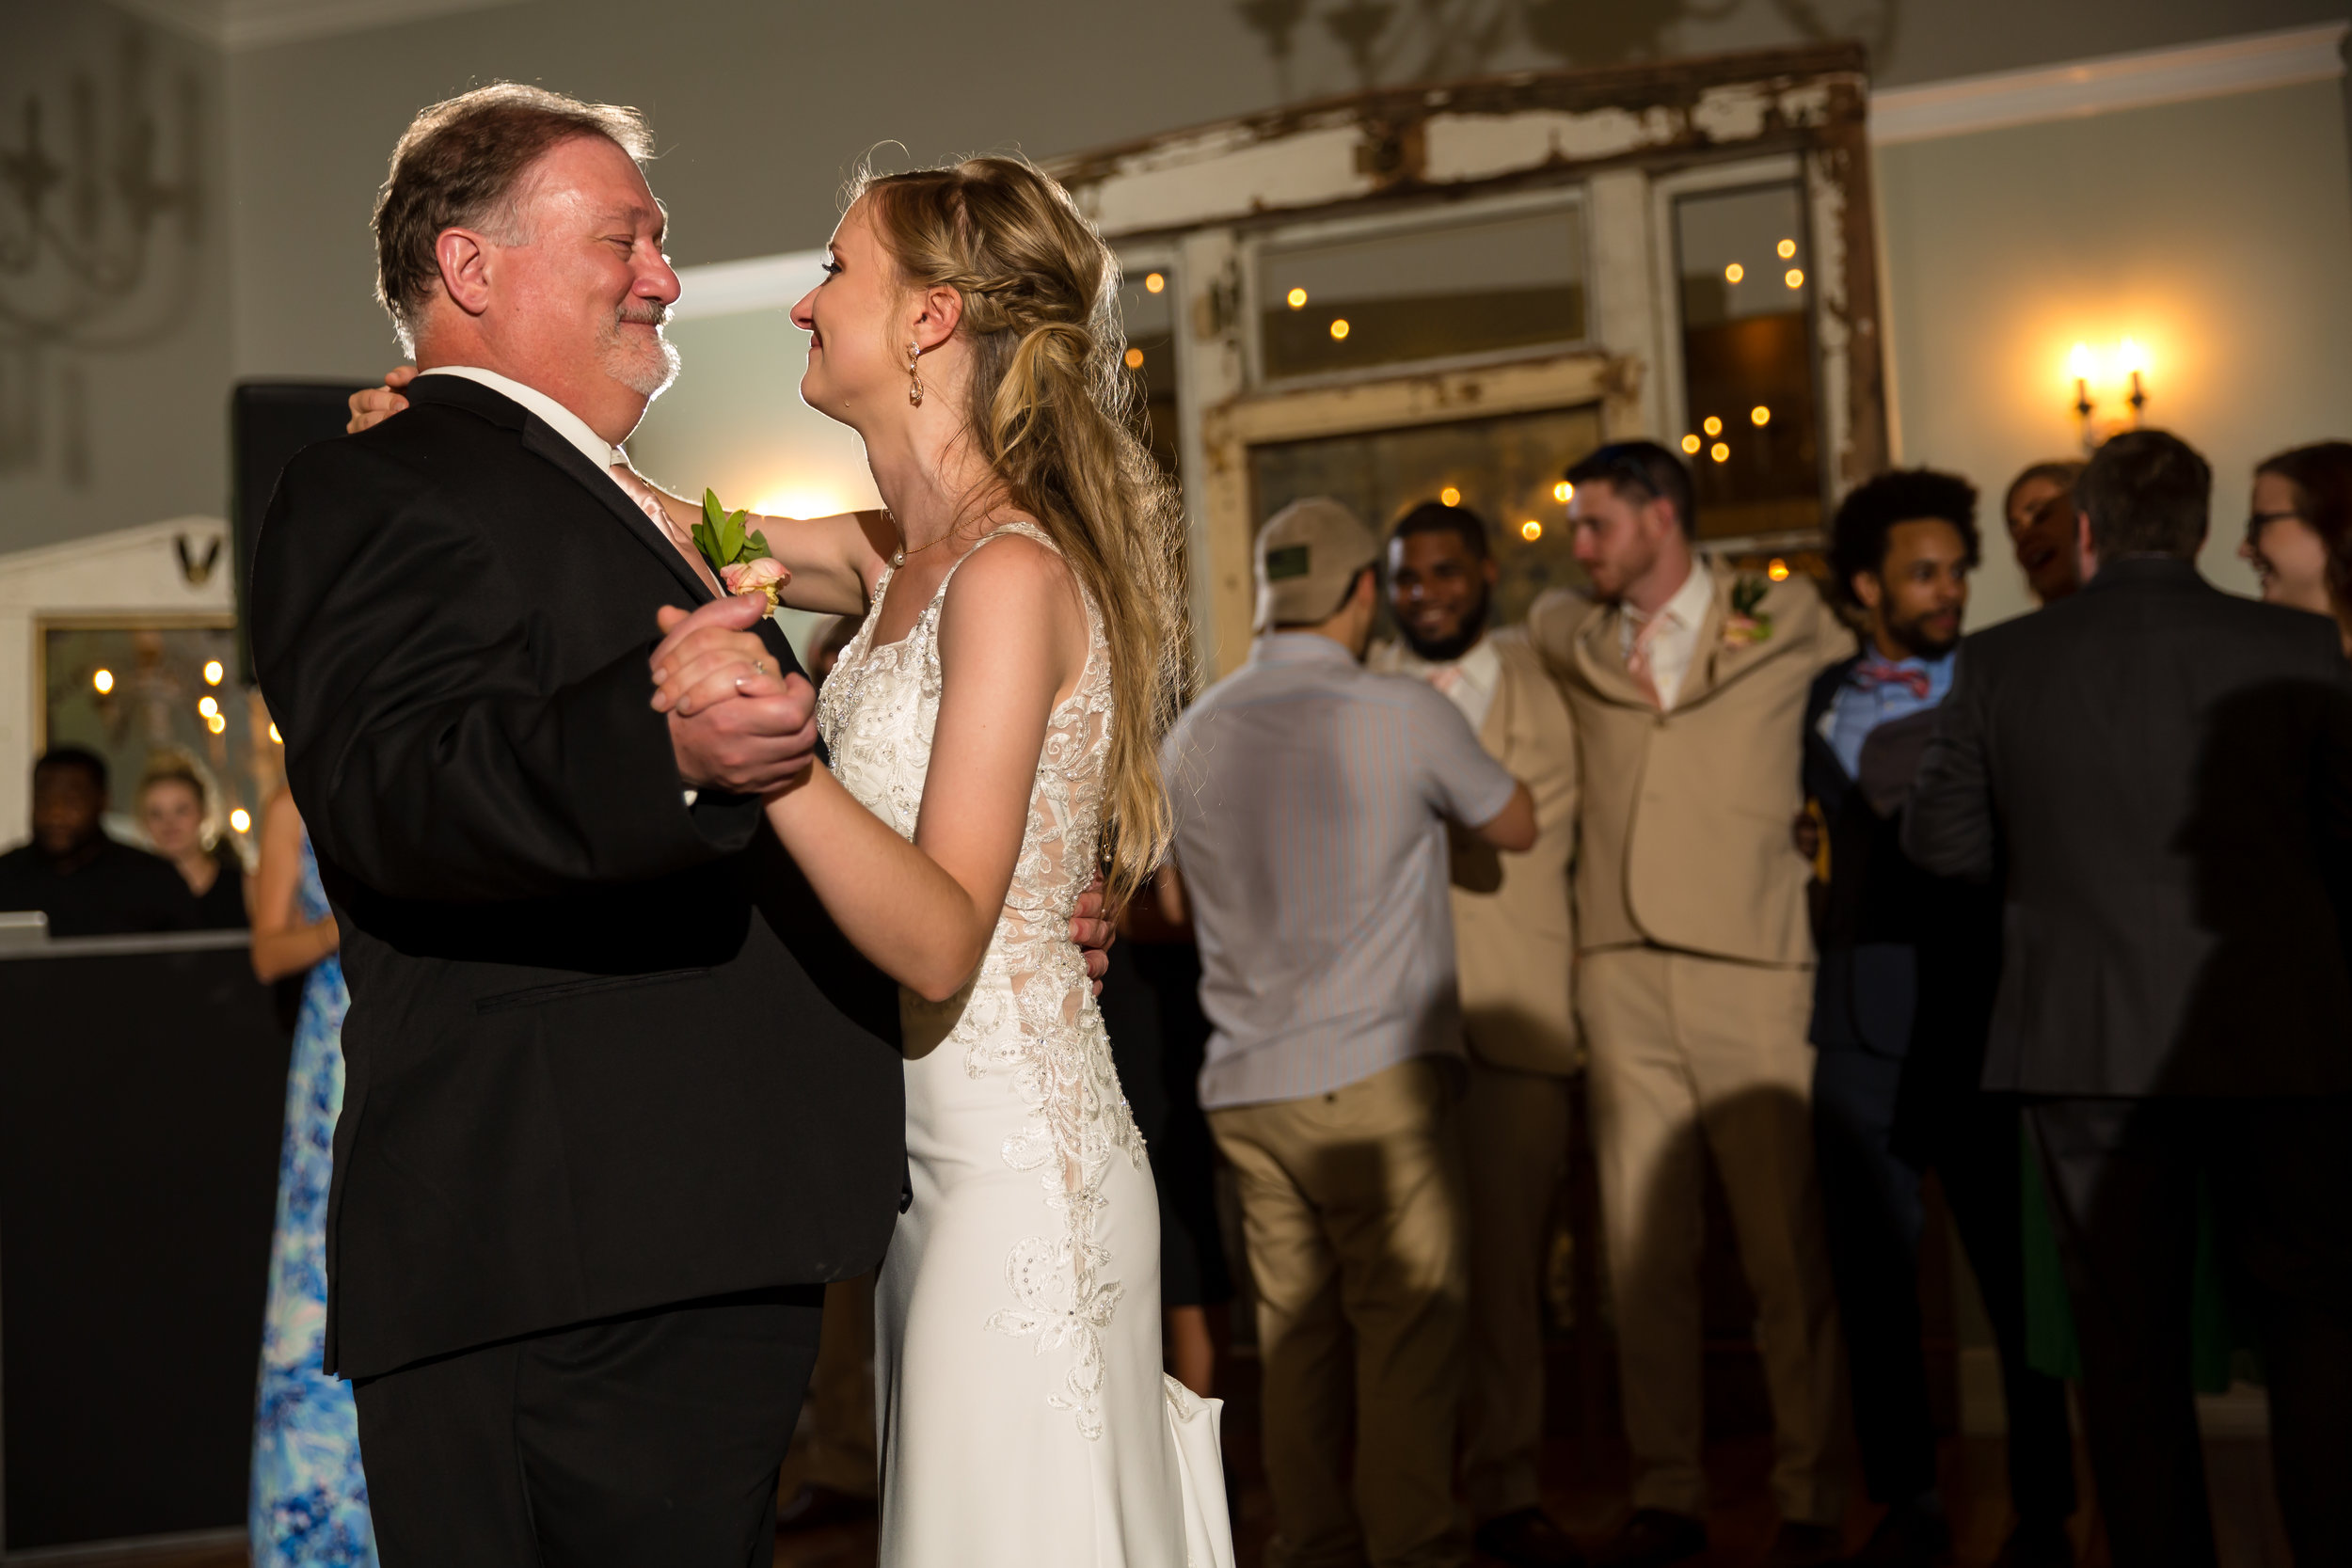 sarah_ikeem_wedding_at_the_parlour_at_manns_chapel_05.18.19-1452.jpg